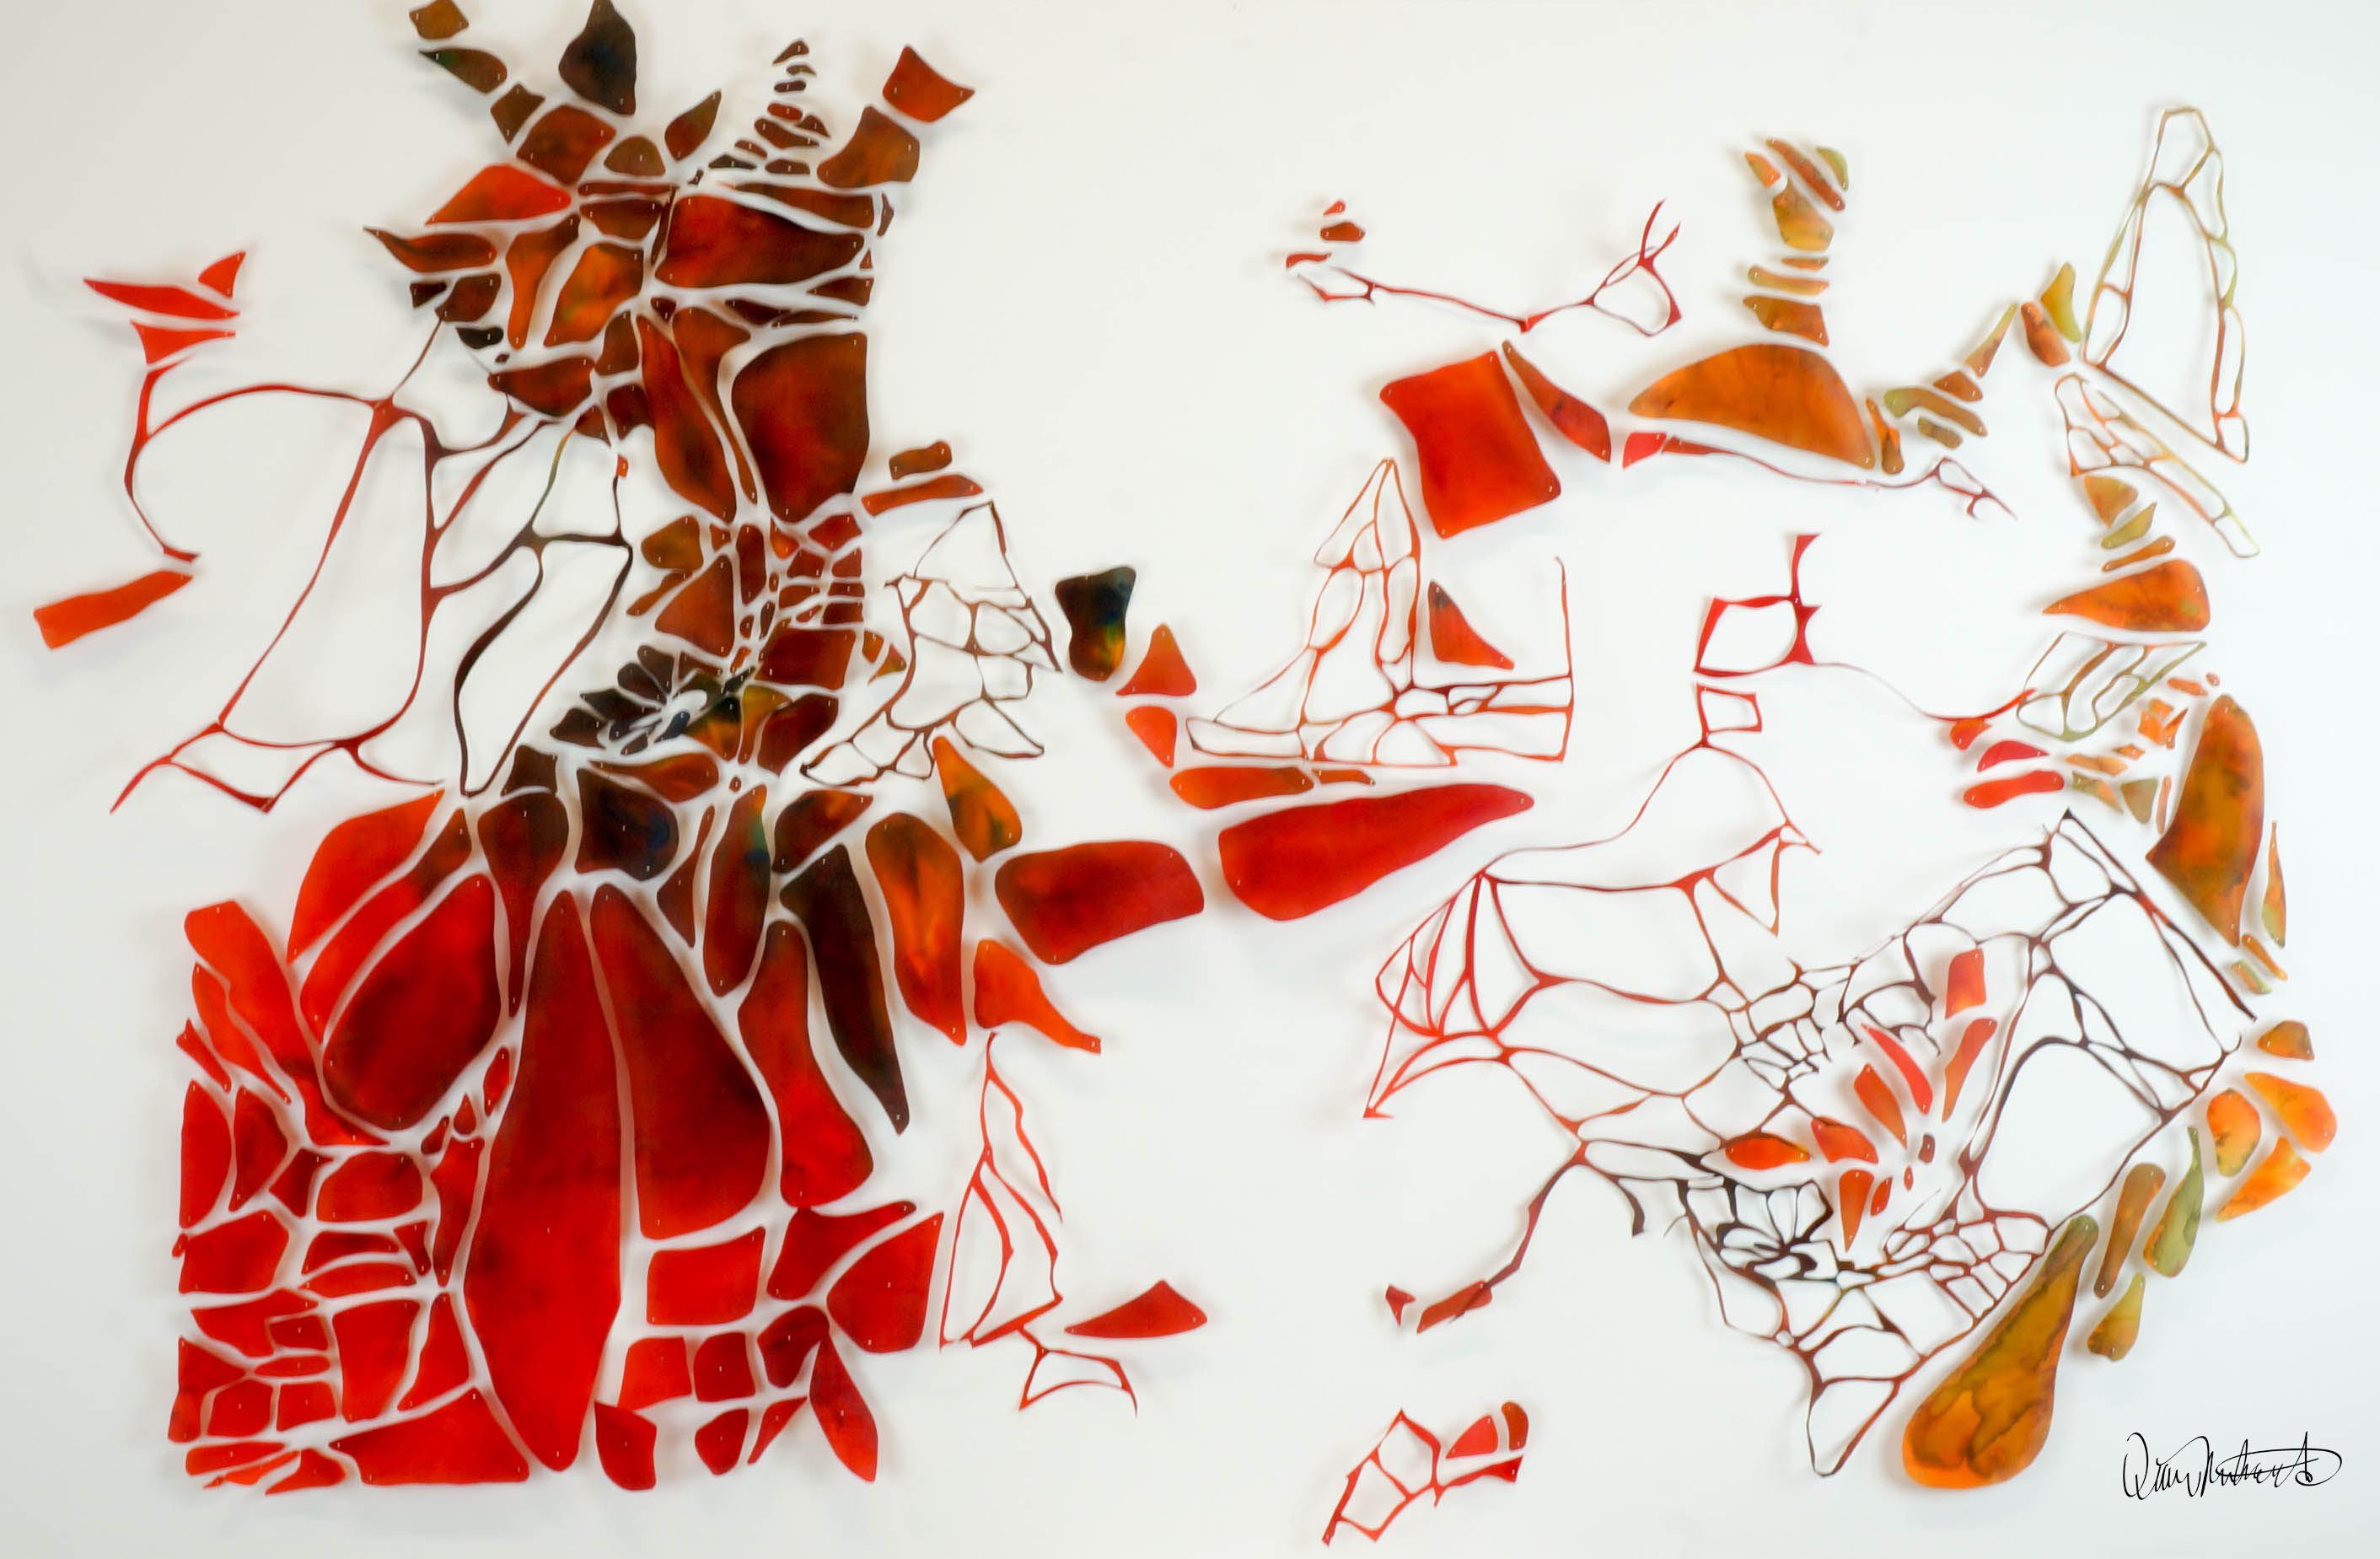 """Diane Deery Richards"", ""Metamorphosis"", Hand-dyed Silk mounted on acetate with pins on foam core 2016"